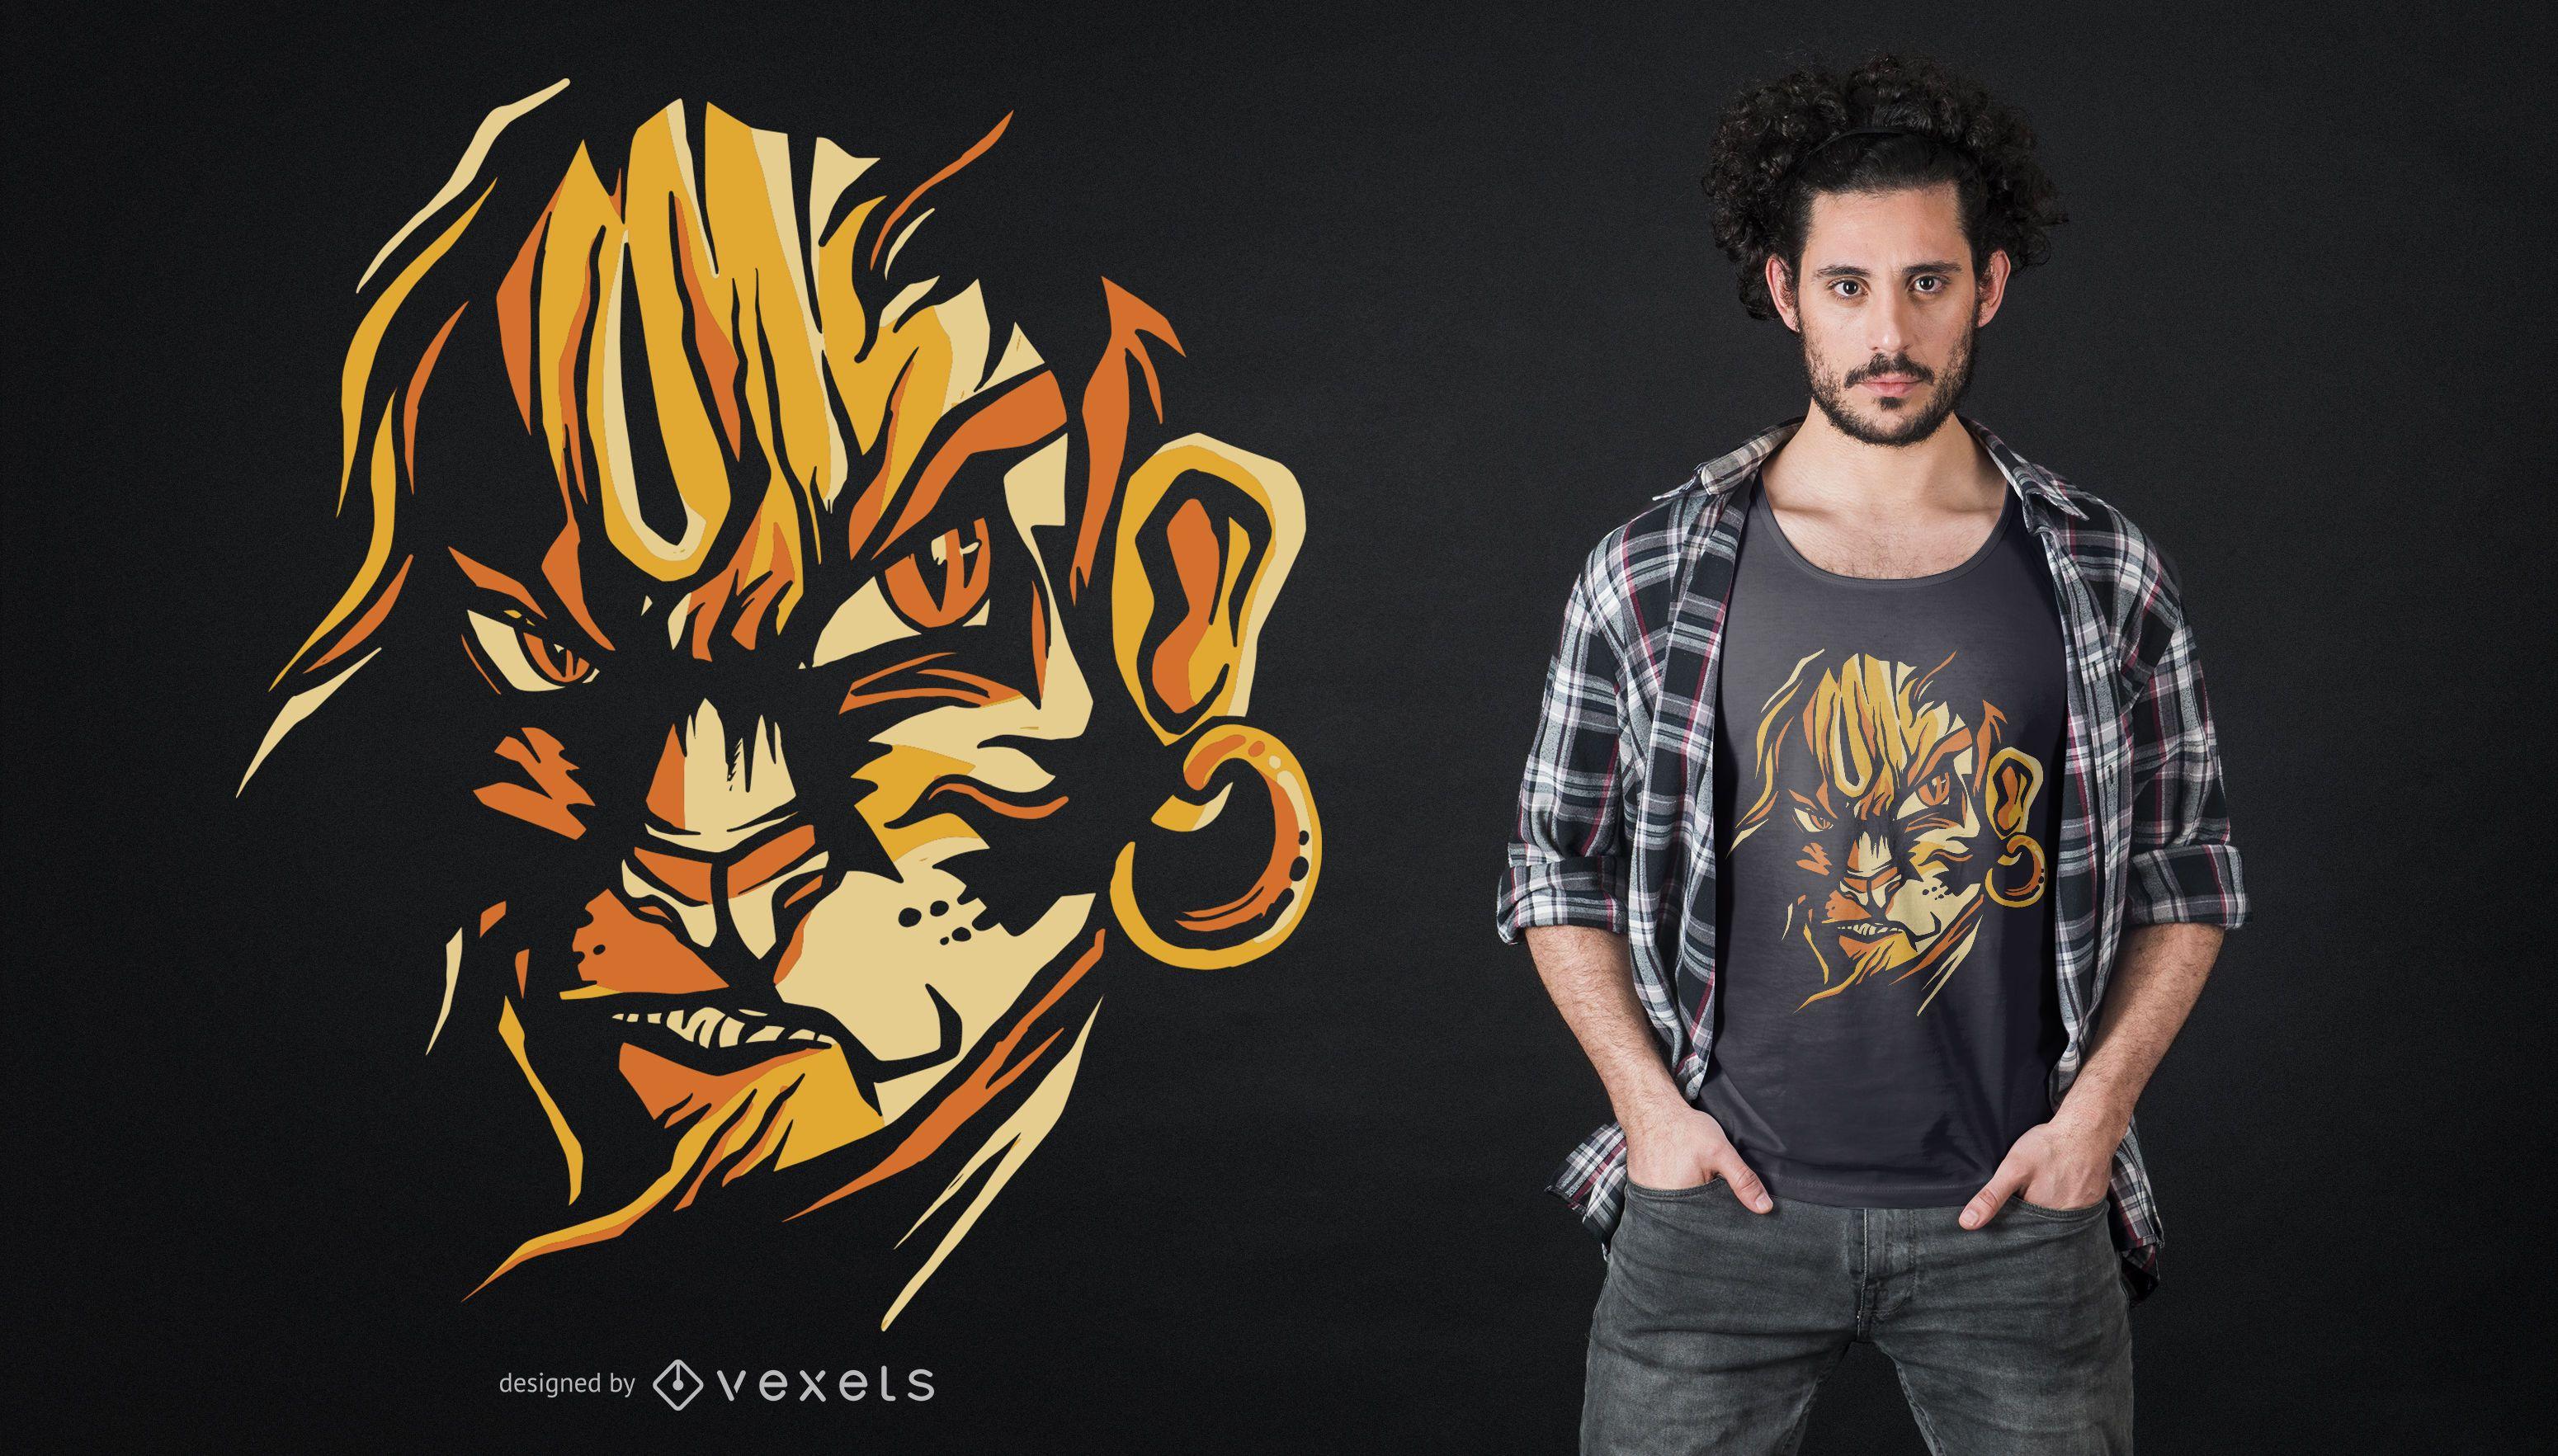 Lord hanuman t-shirt design